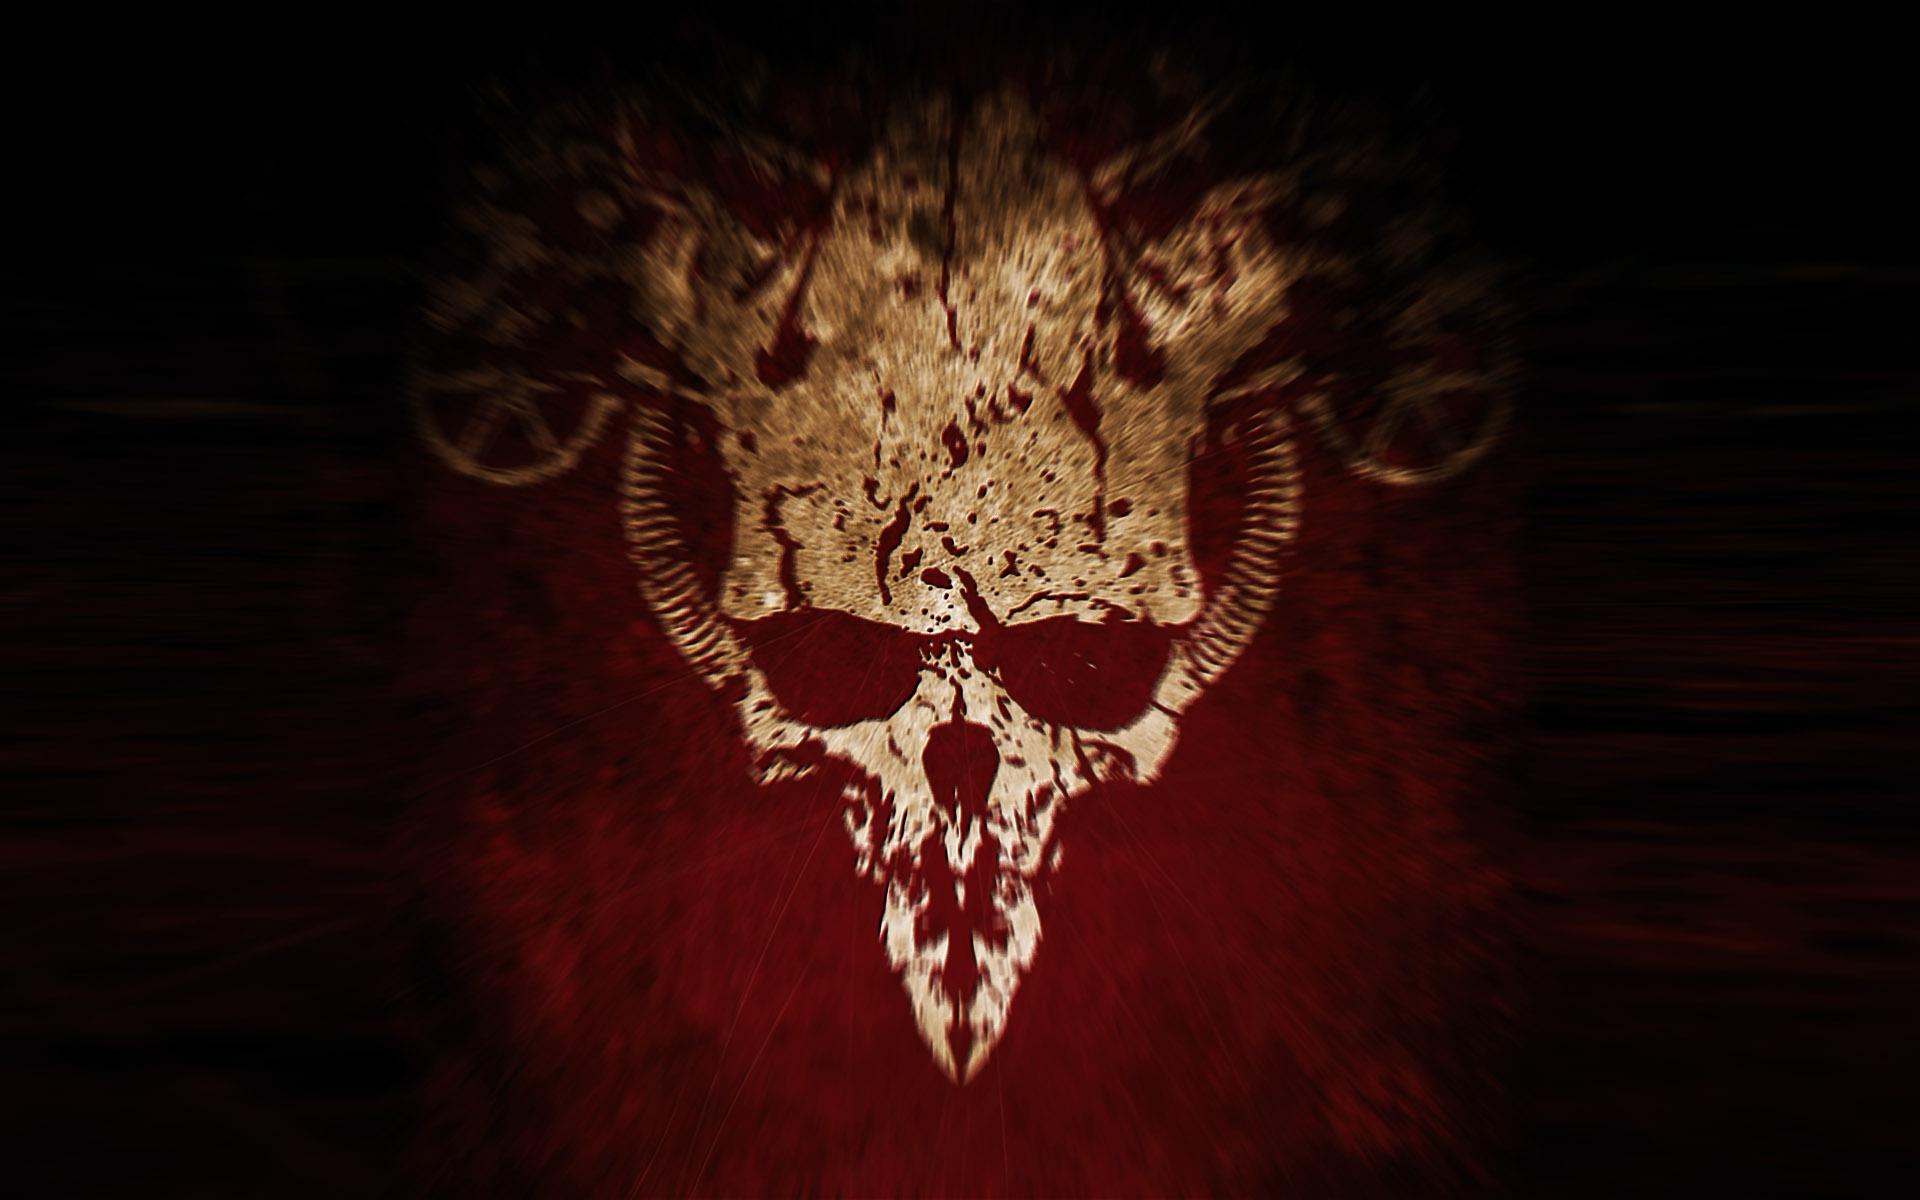 skull wallpapers devil